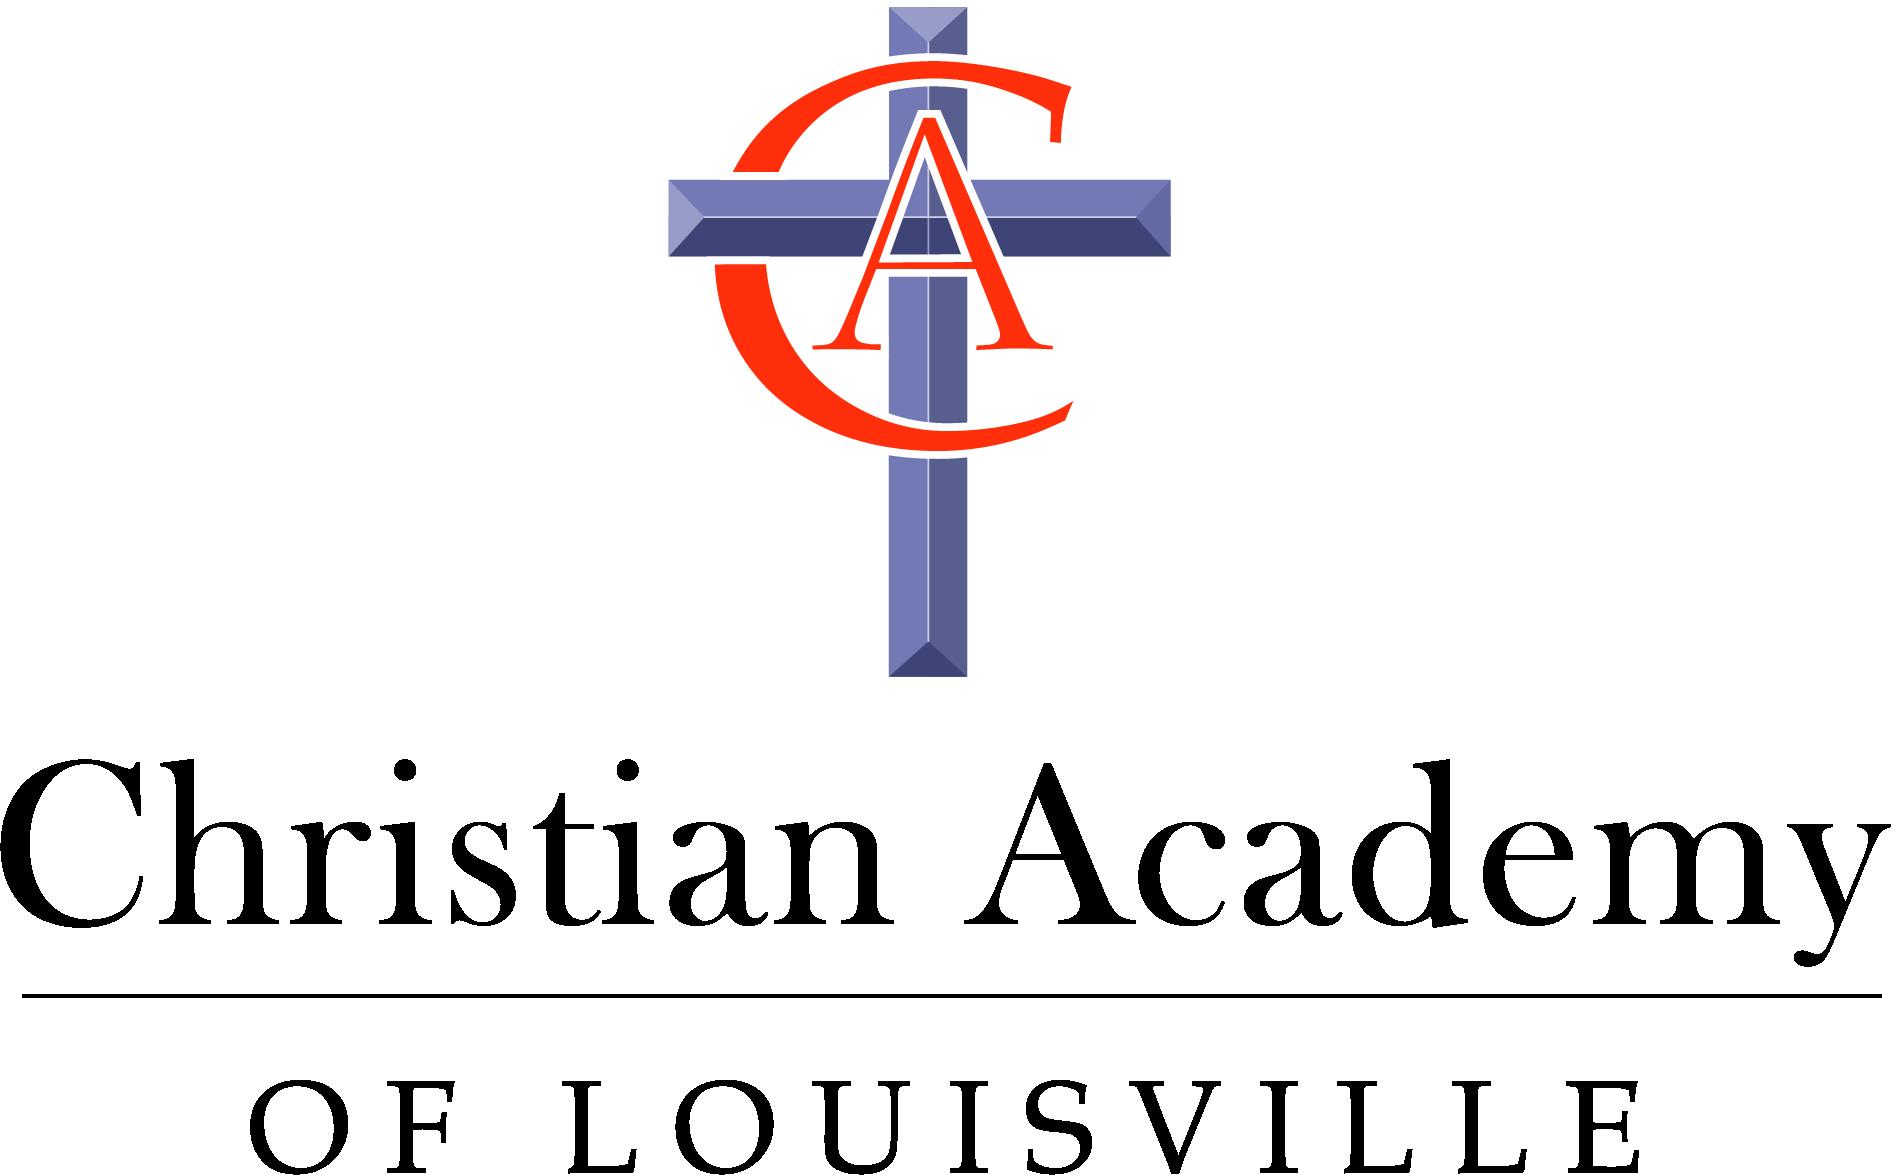 Christian school clipart svg Logo Files | Christian Academy School System svg